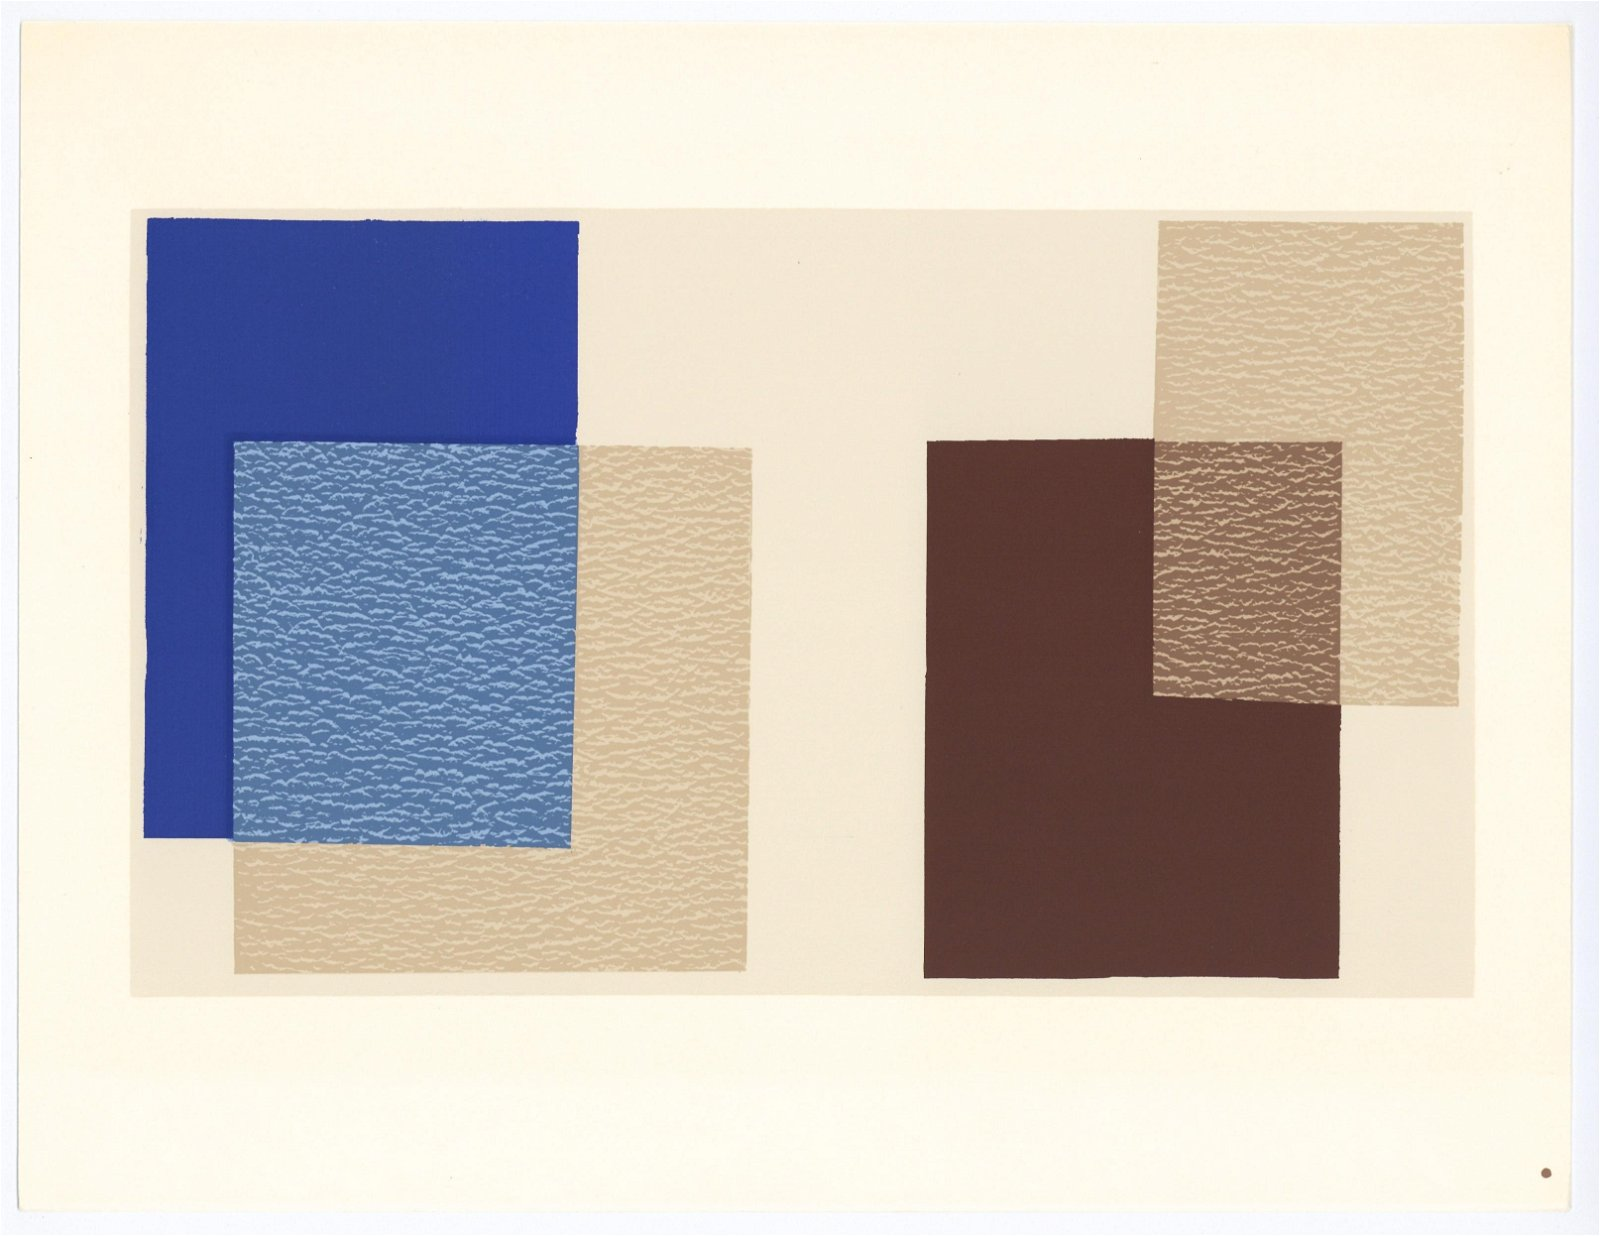 Josef Albers silkscreen | Interaction of Color, 1963